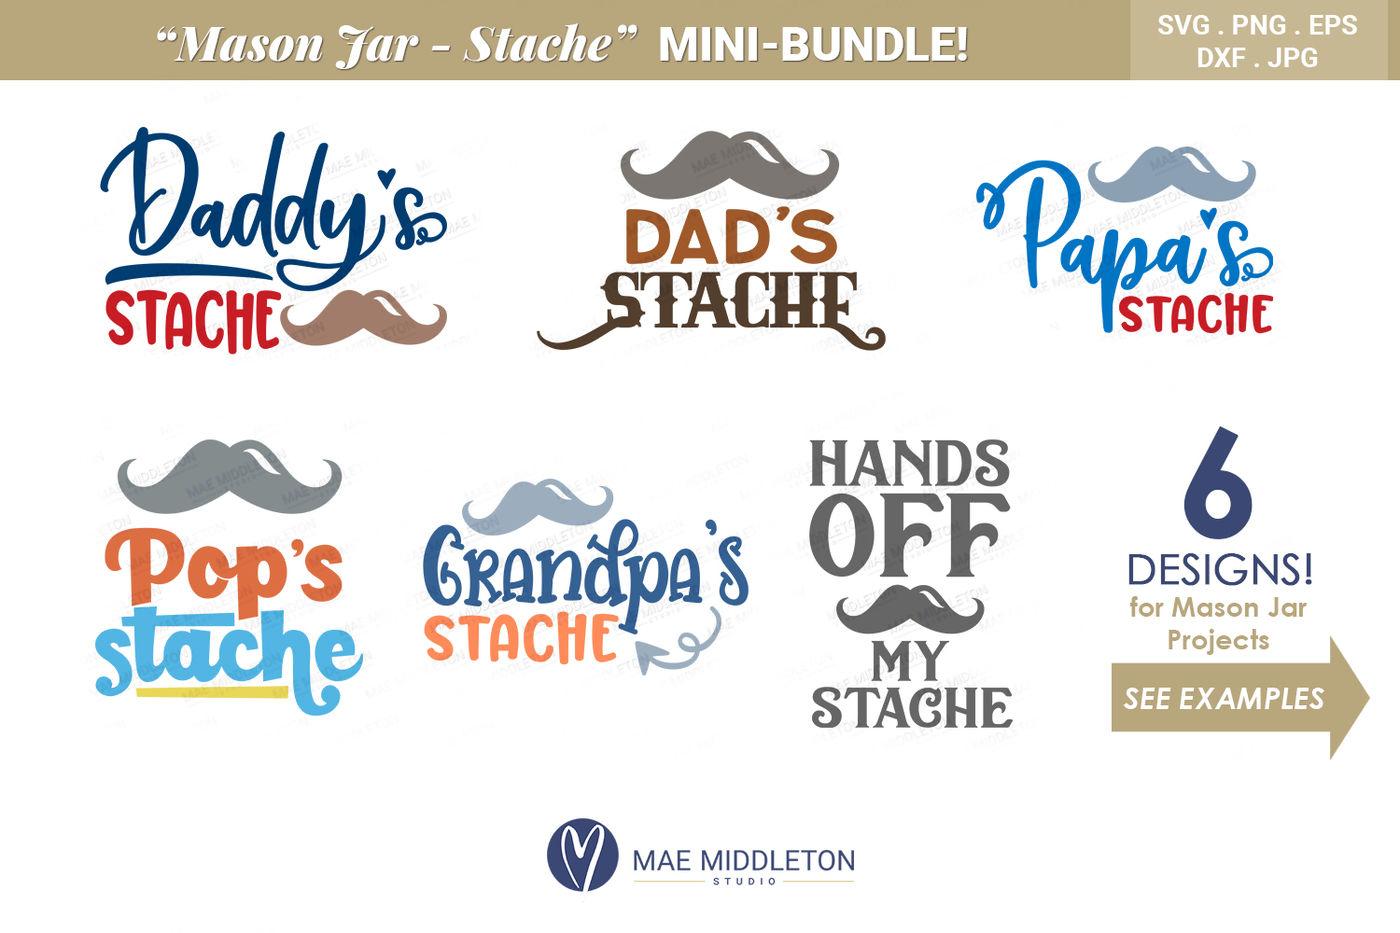 Dad Grandpa S Stache Mini Bundle Svg Files Jpg Png Dxf Eps By